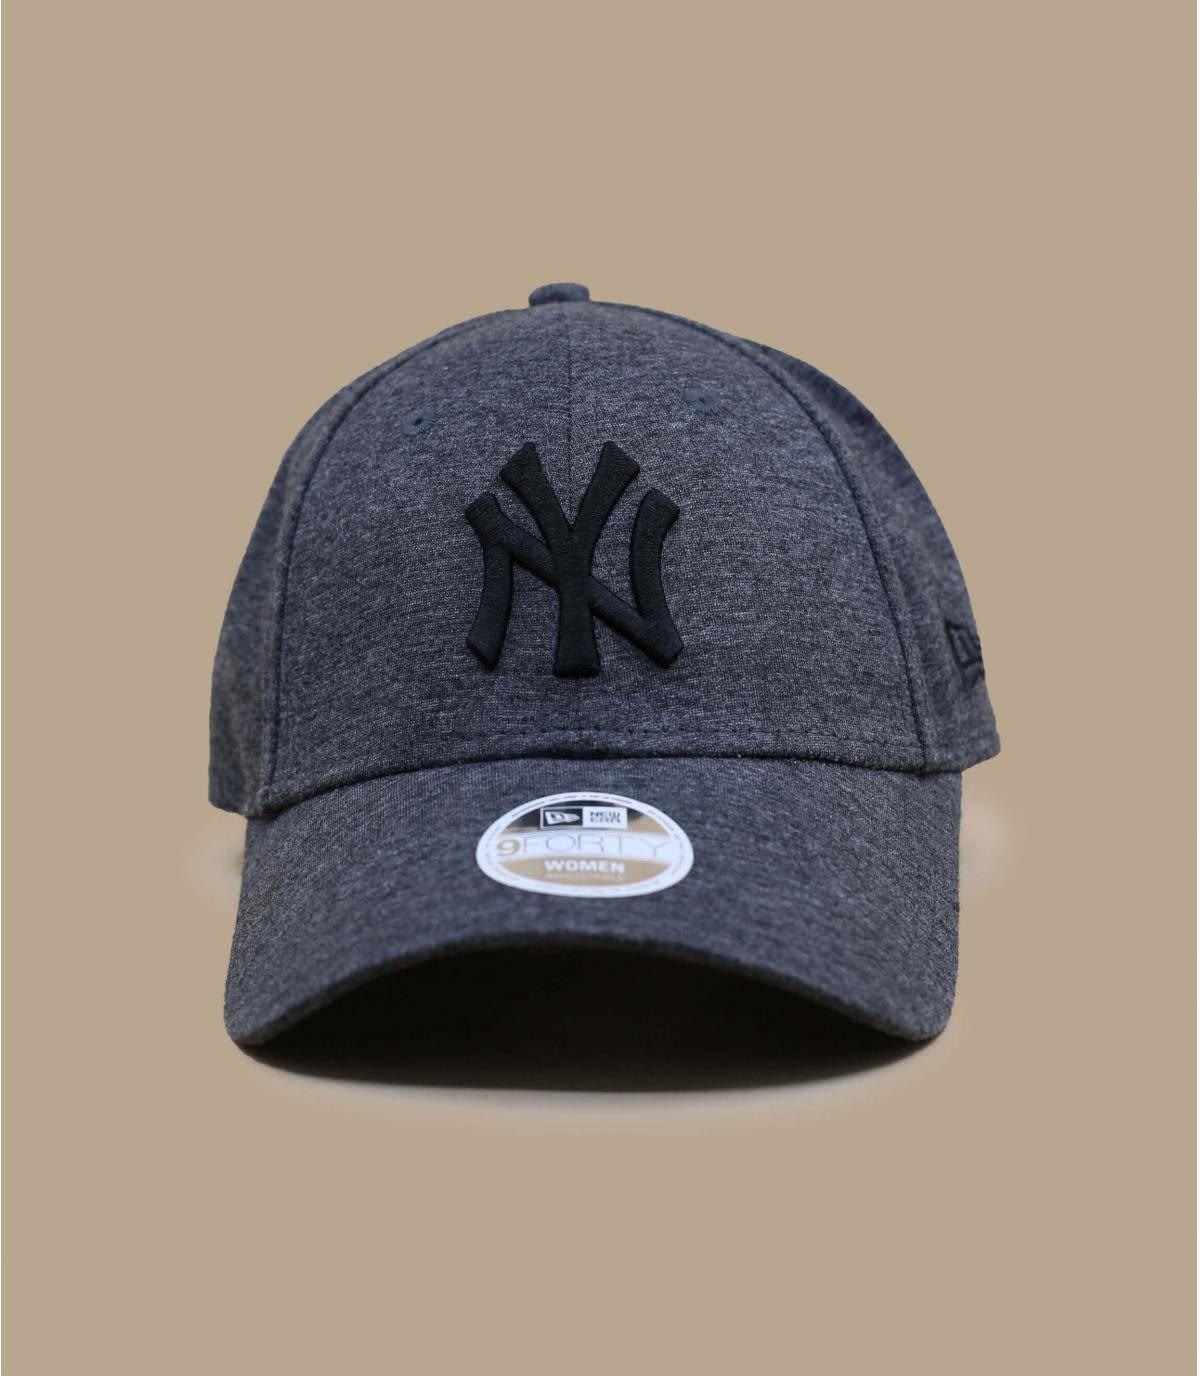 Details Wmns Jersey 940 NY graphite - Abbildung 2